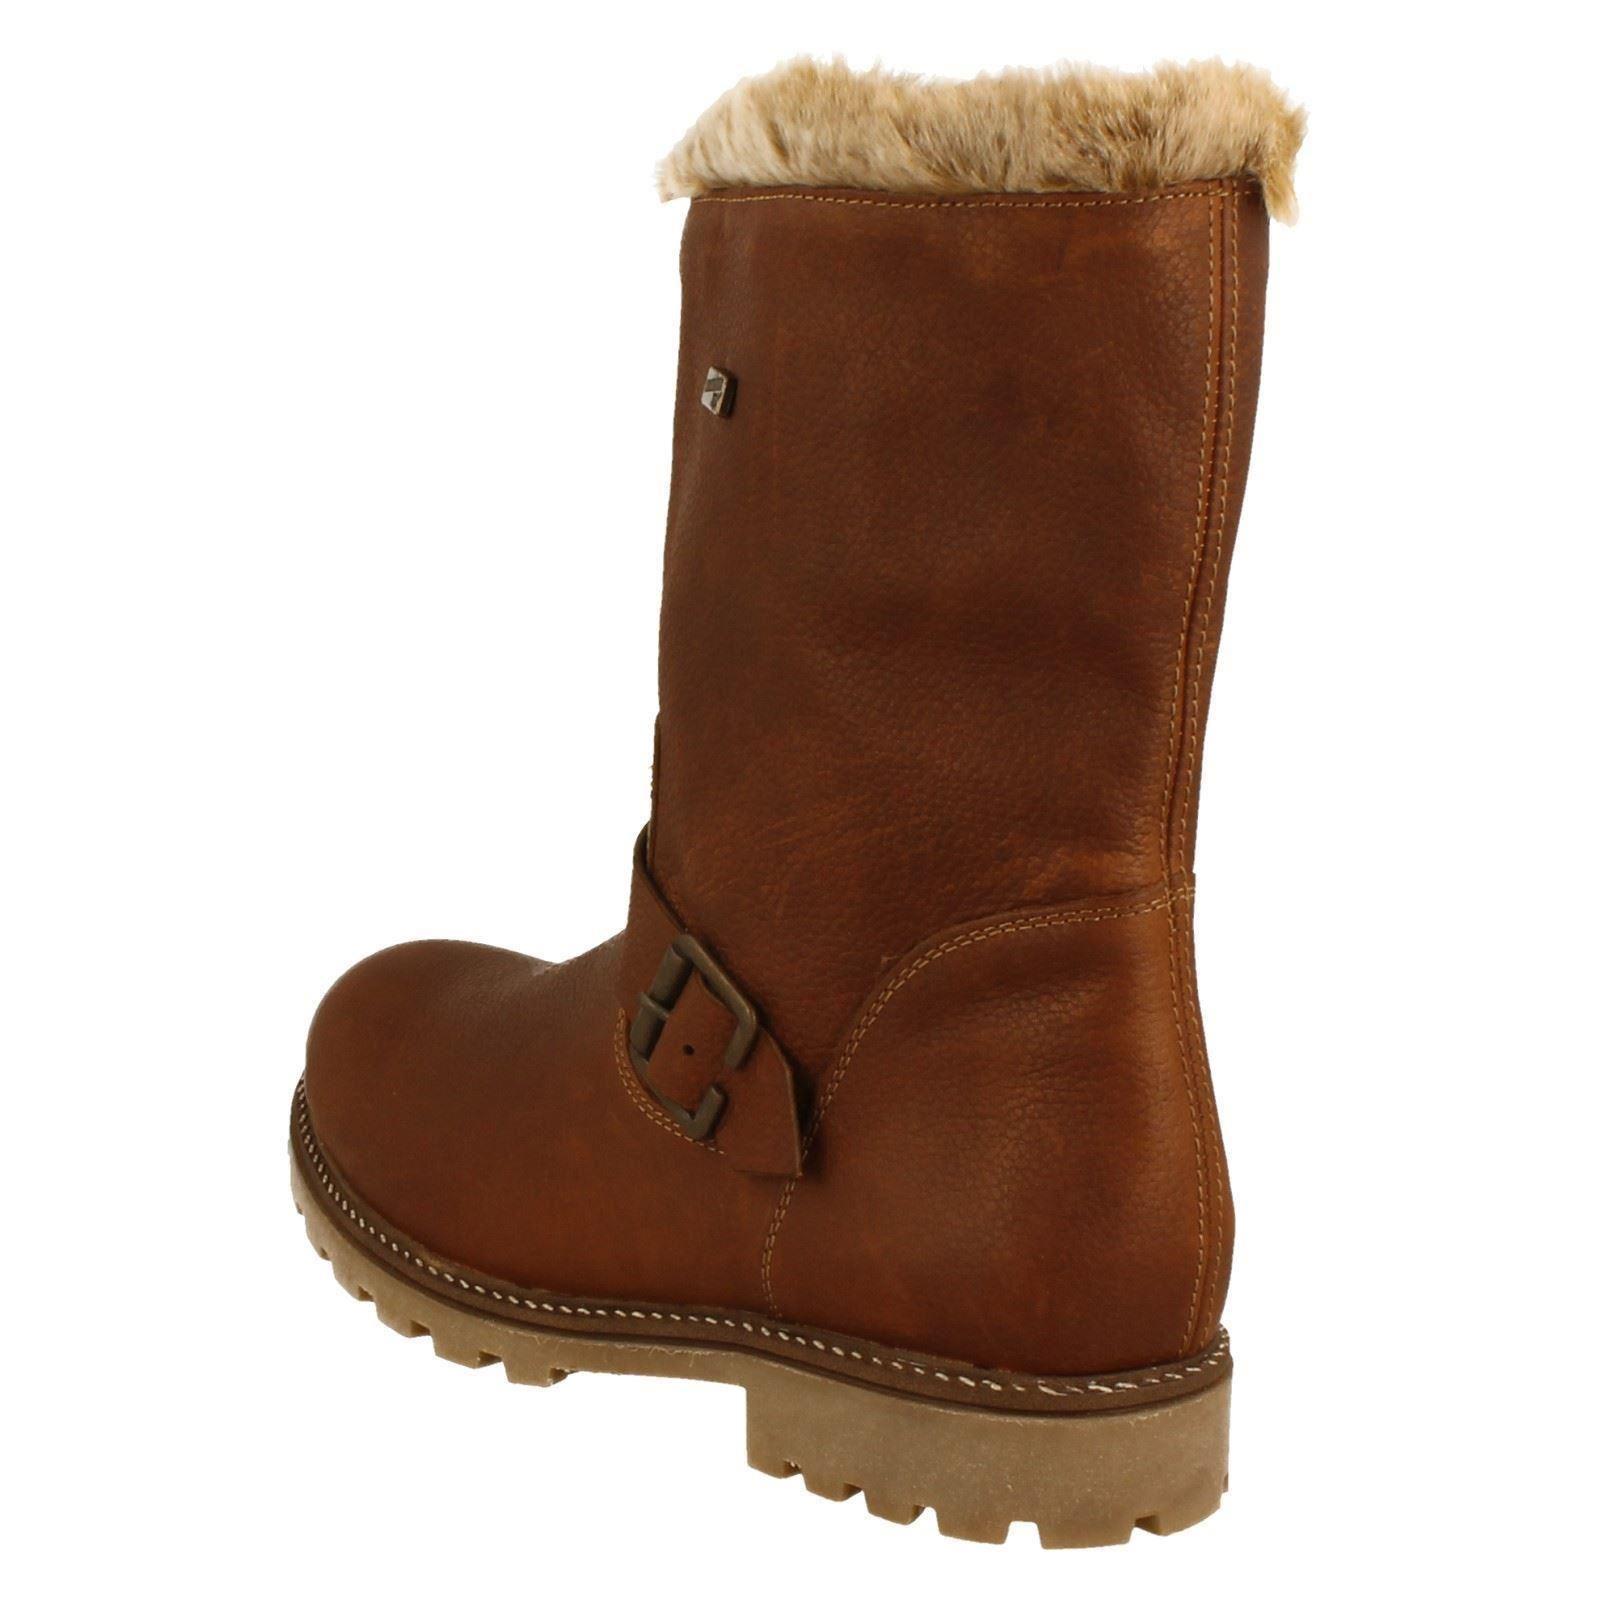 Damas Remonte Cálido botas Forrado botas Cálido con remonte Tex estilo D7481-W 4cd79d